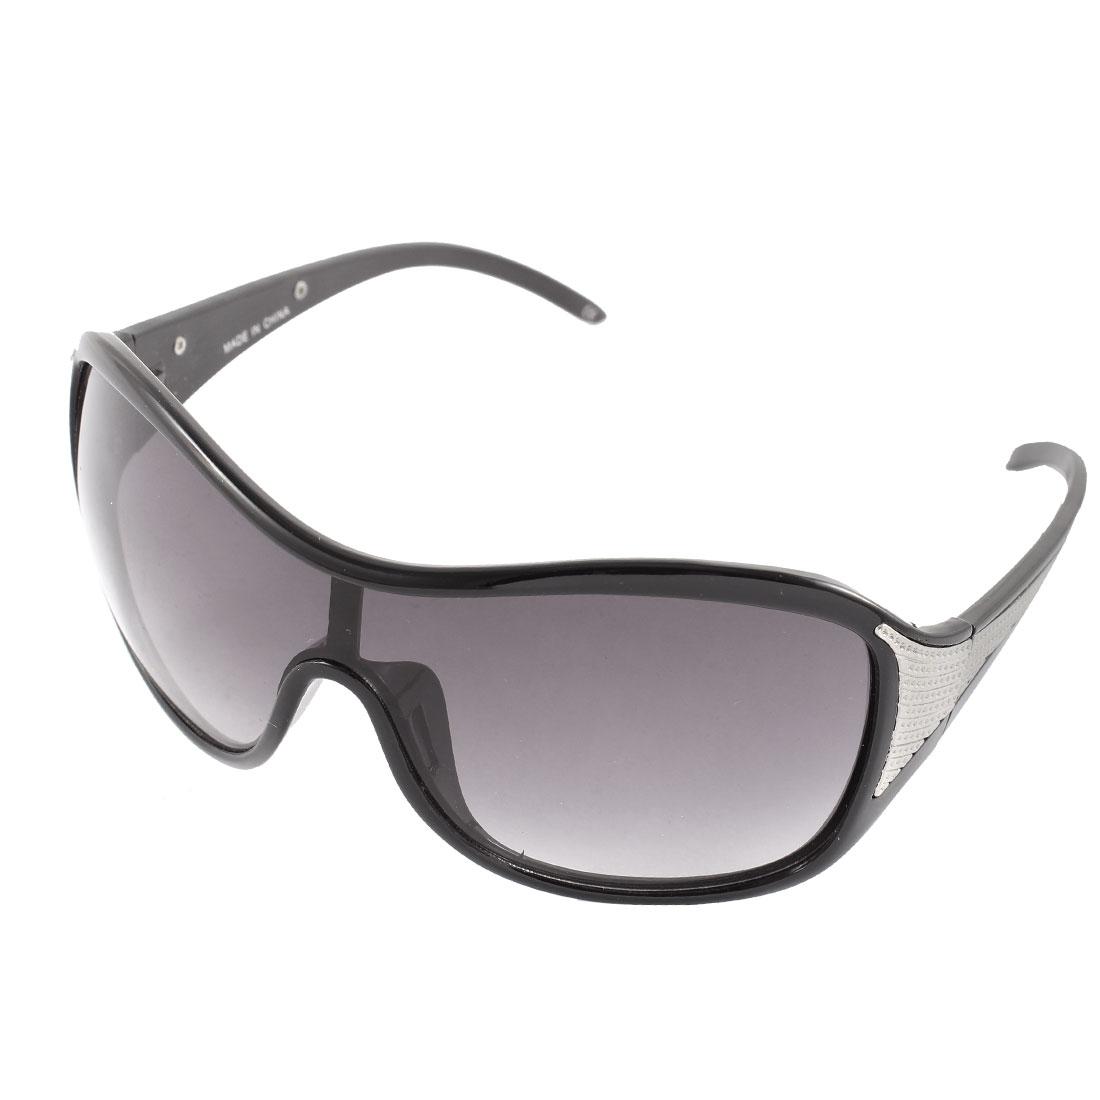 Plastic Metal Women Full Rim Sun Protection Eyewear Sunglasses Black